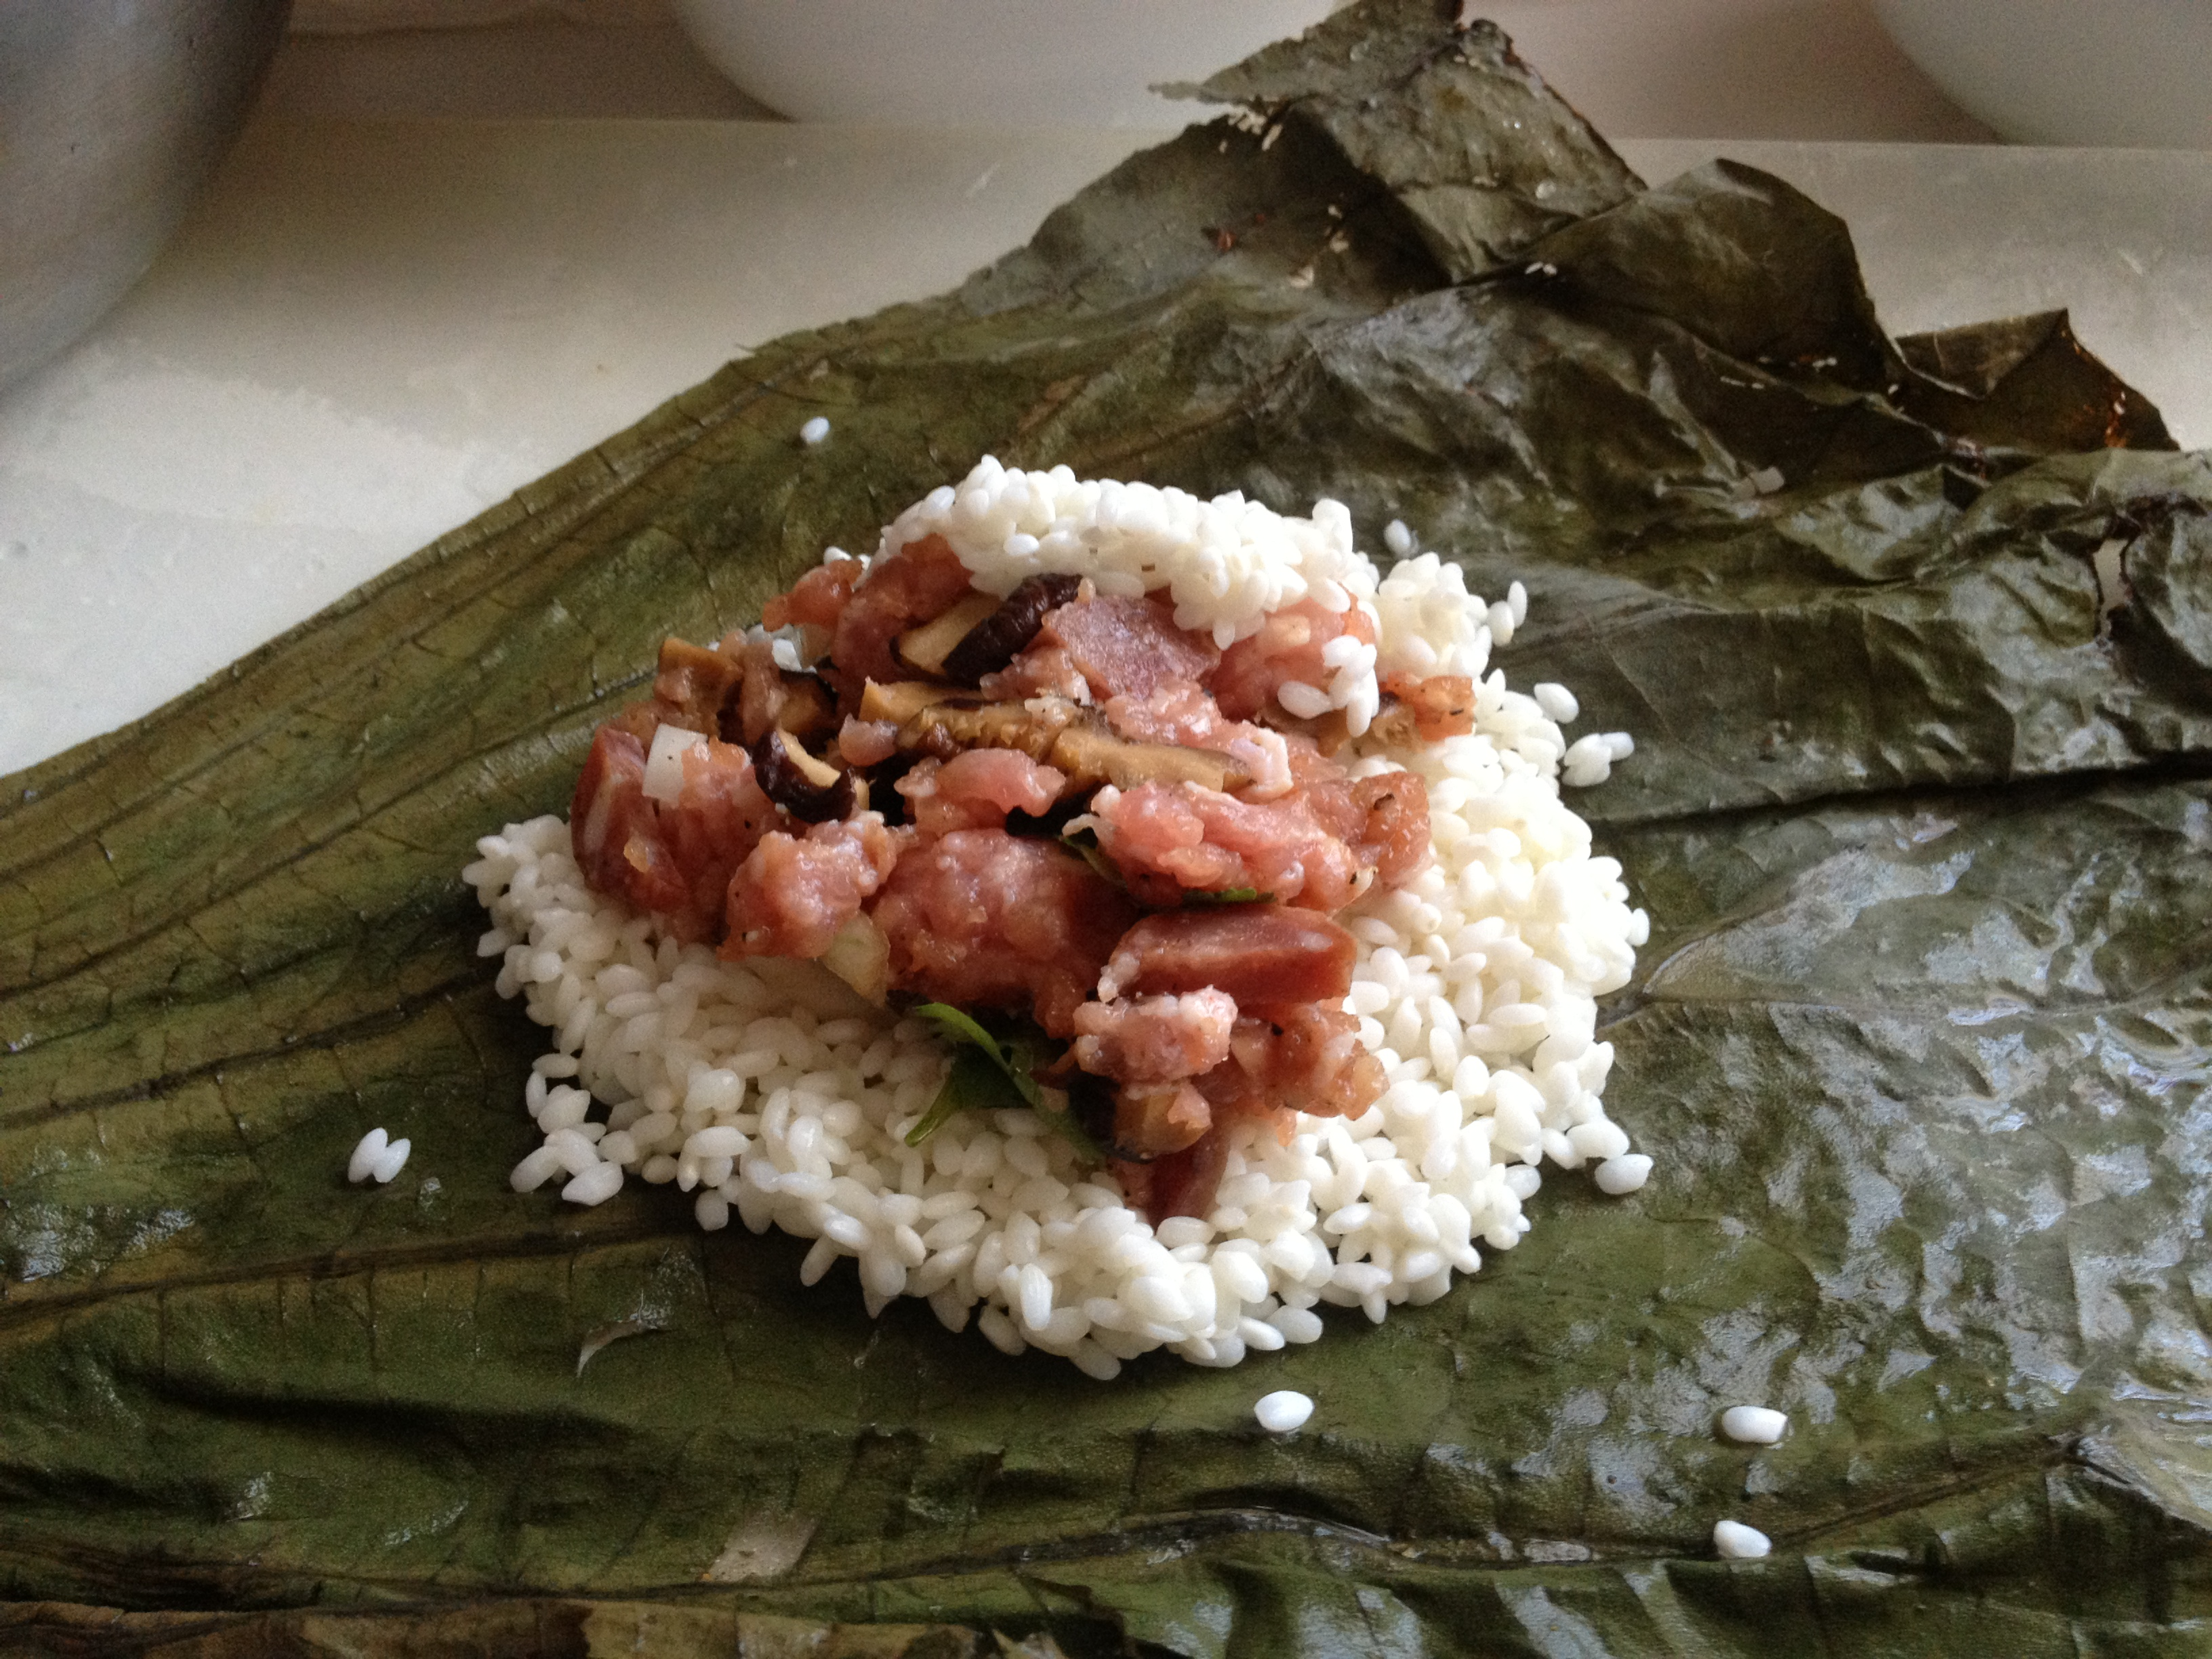 Banana Leaf Wrapped Rice Banana Leaf And Wrapped it